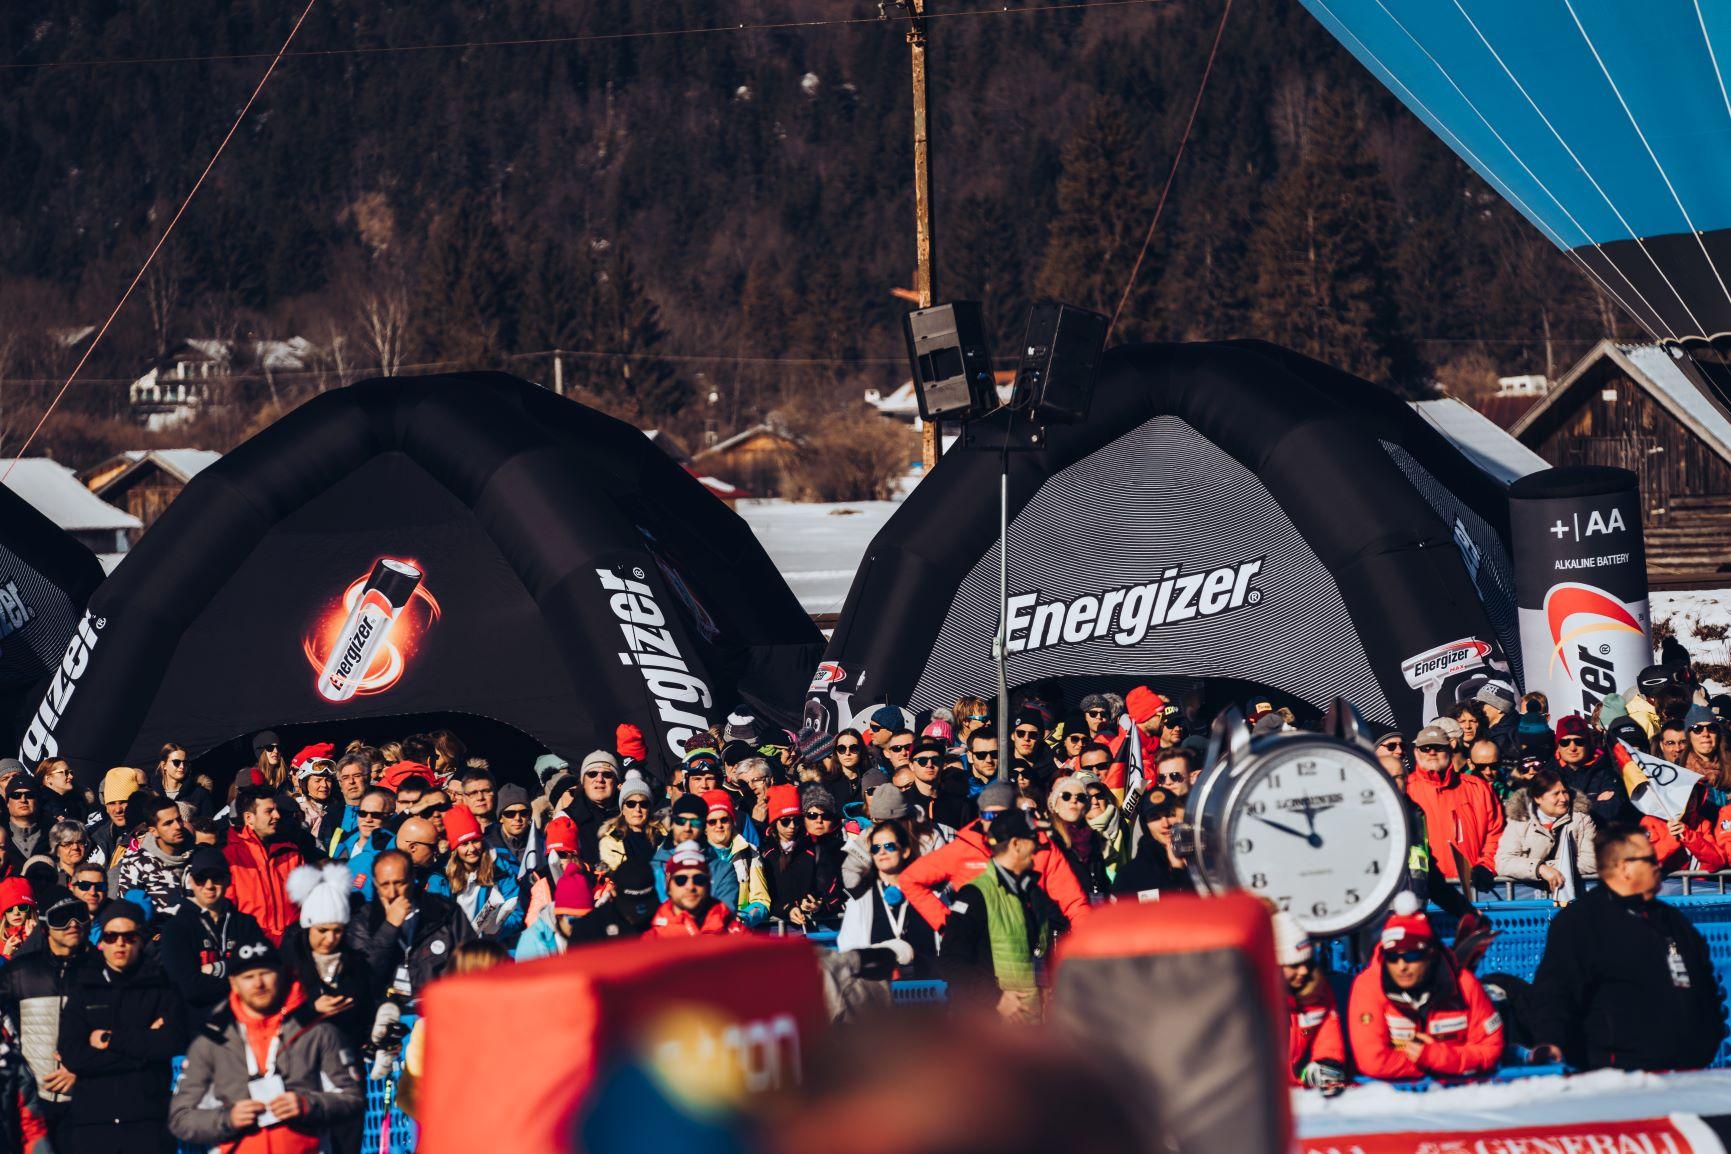 Energizer auf dem Audi FIS Ski Weltcup